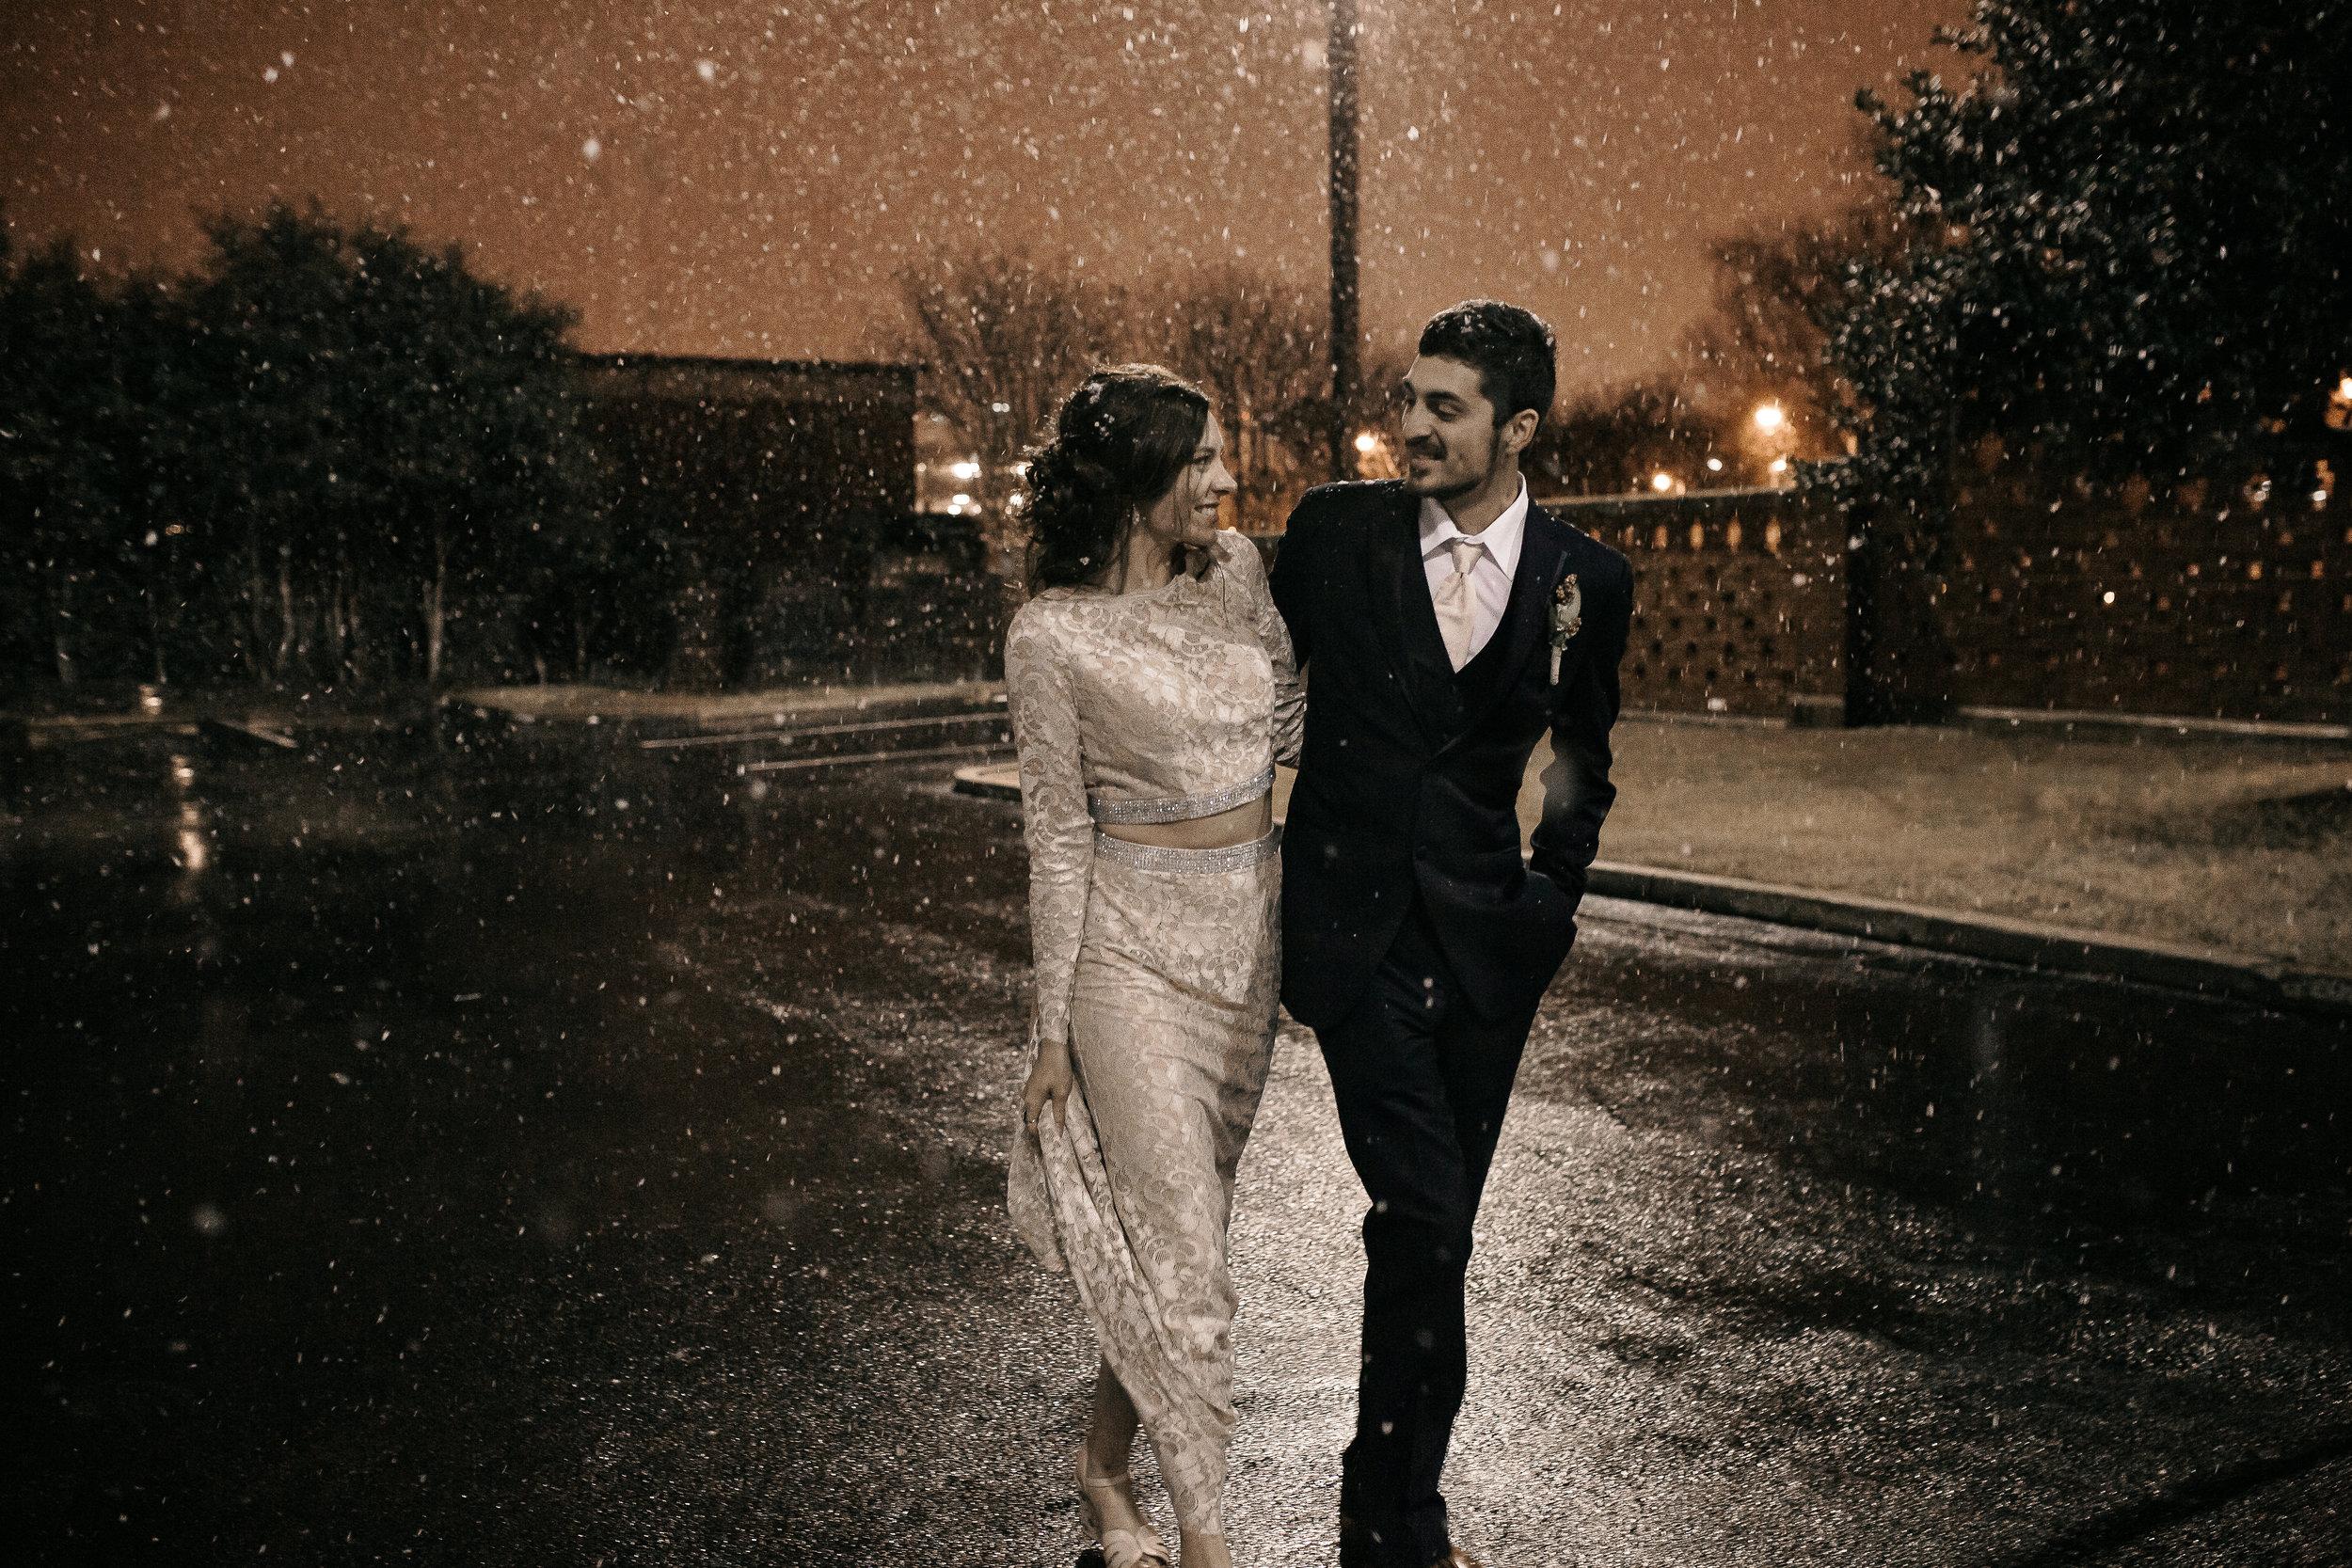 memphis-wedding-photographer-cassie-cook-photography